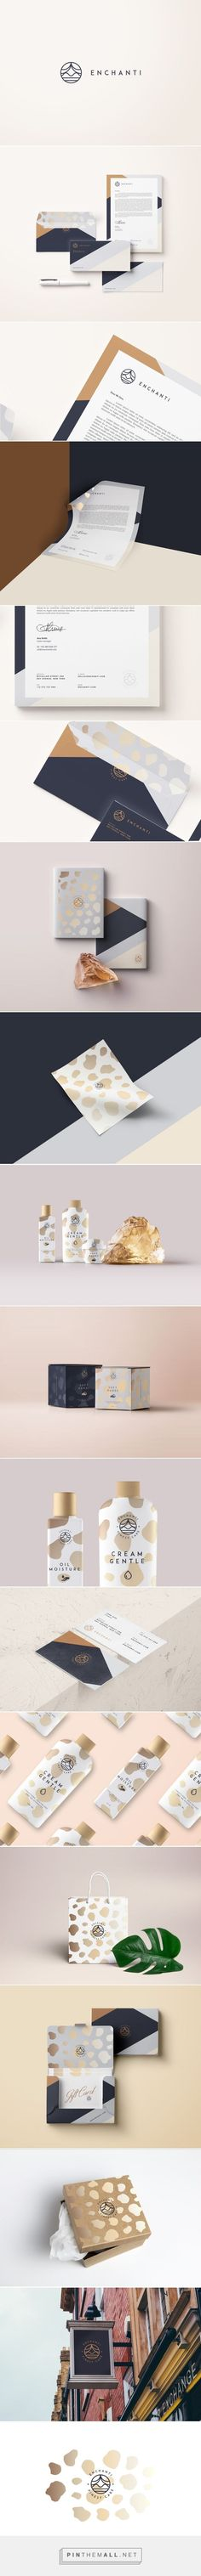 Enchanti Finest Care Cosmetic Branding by Sebastian Bednarek